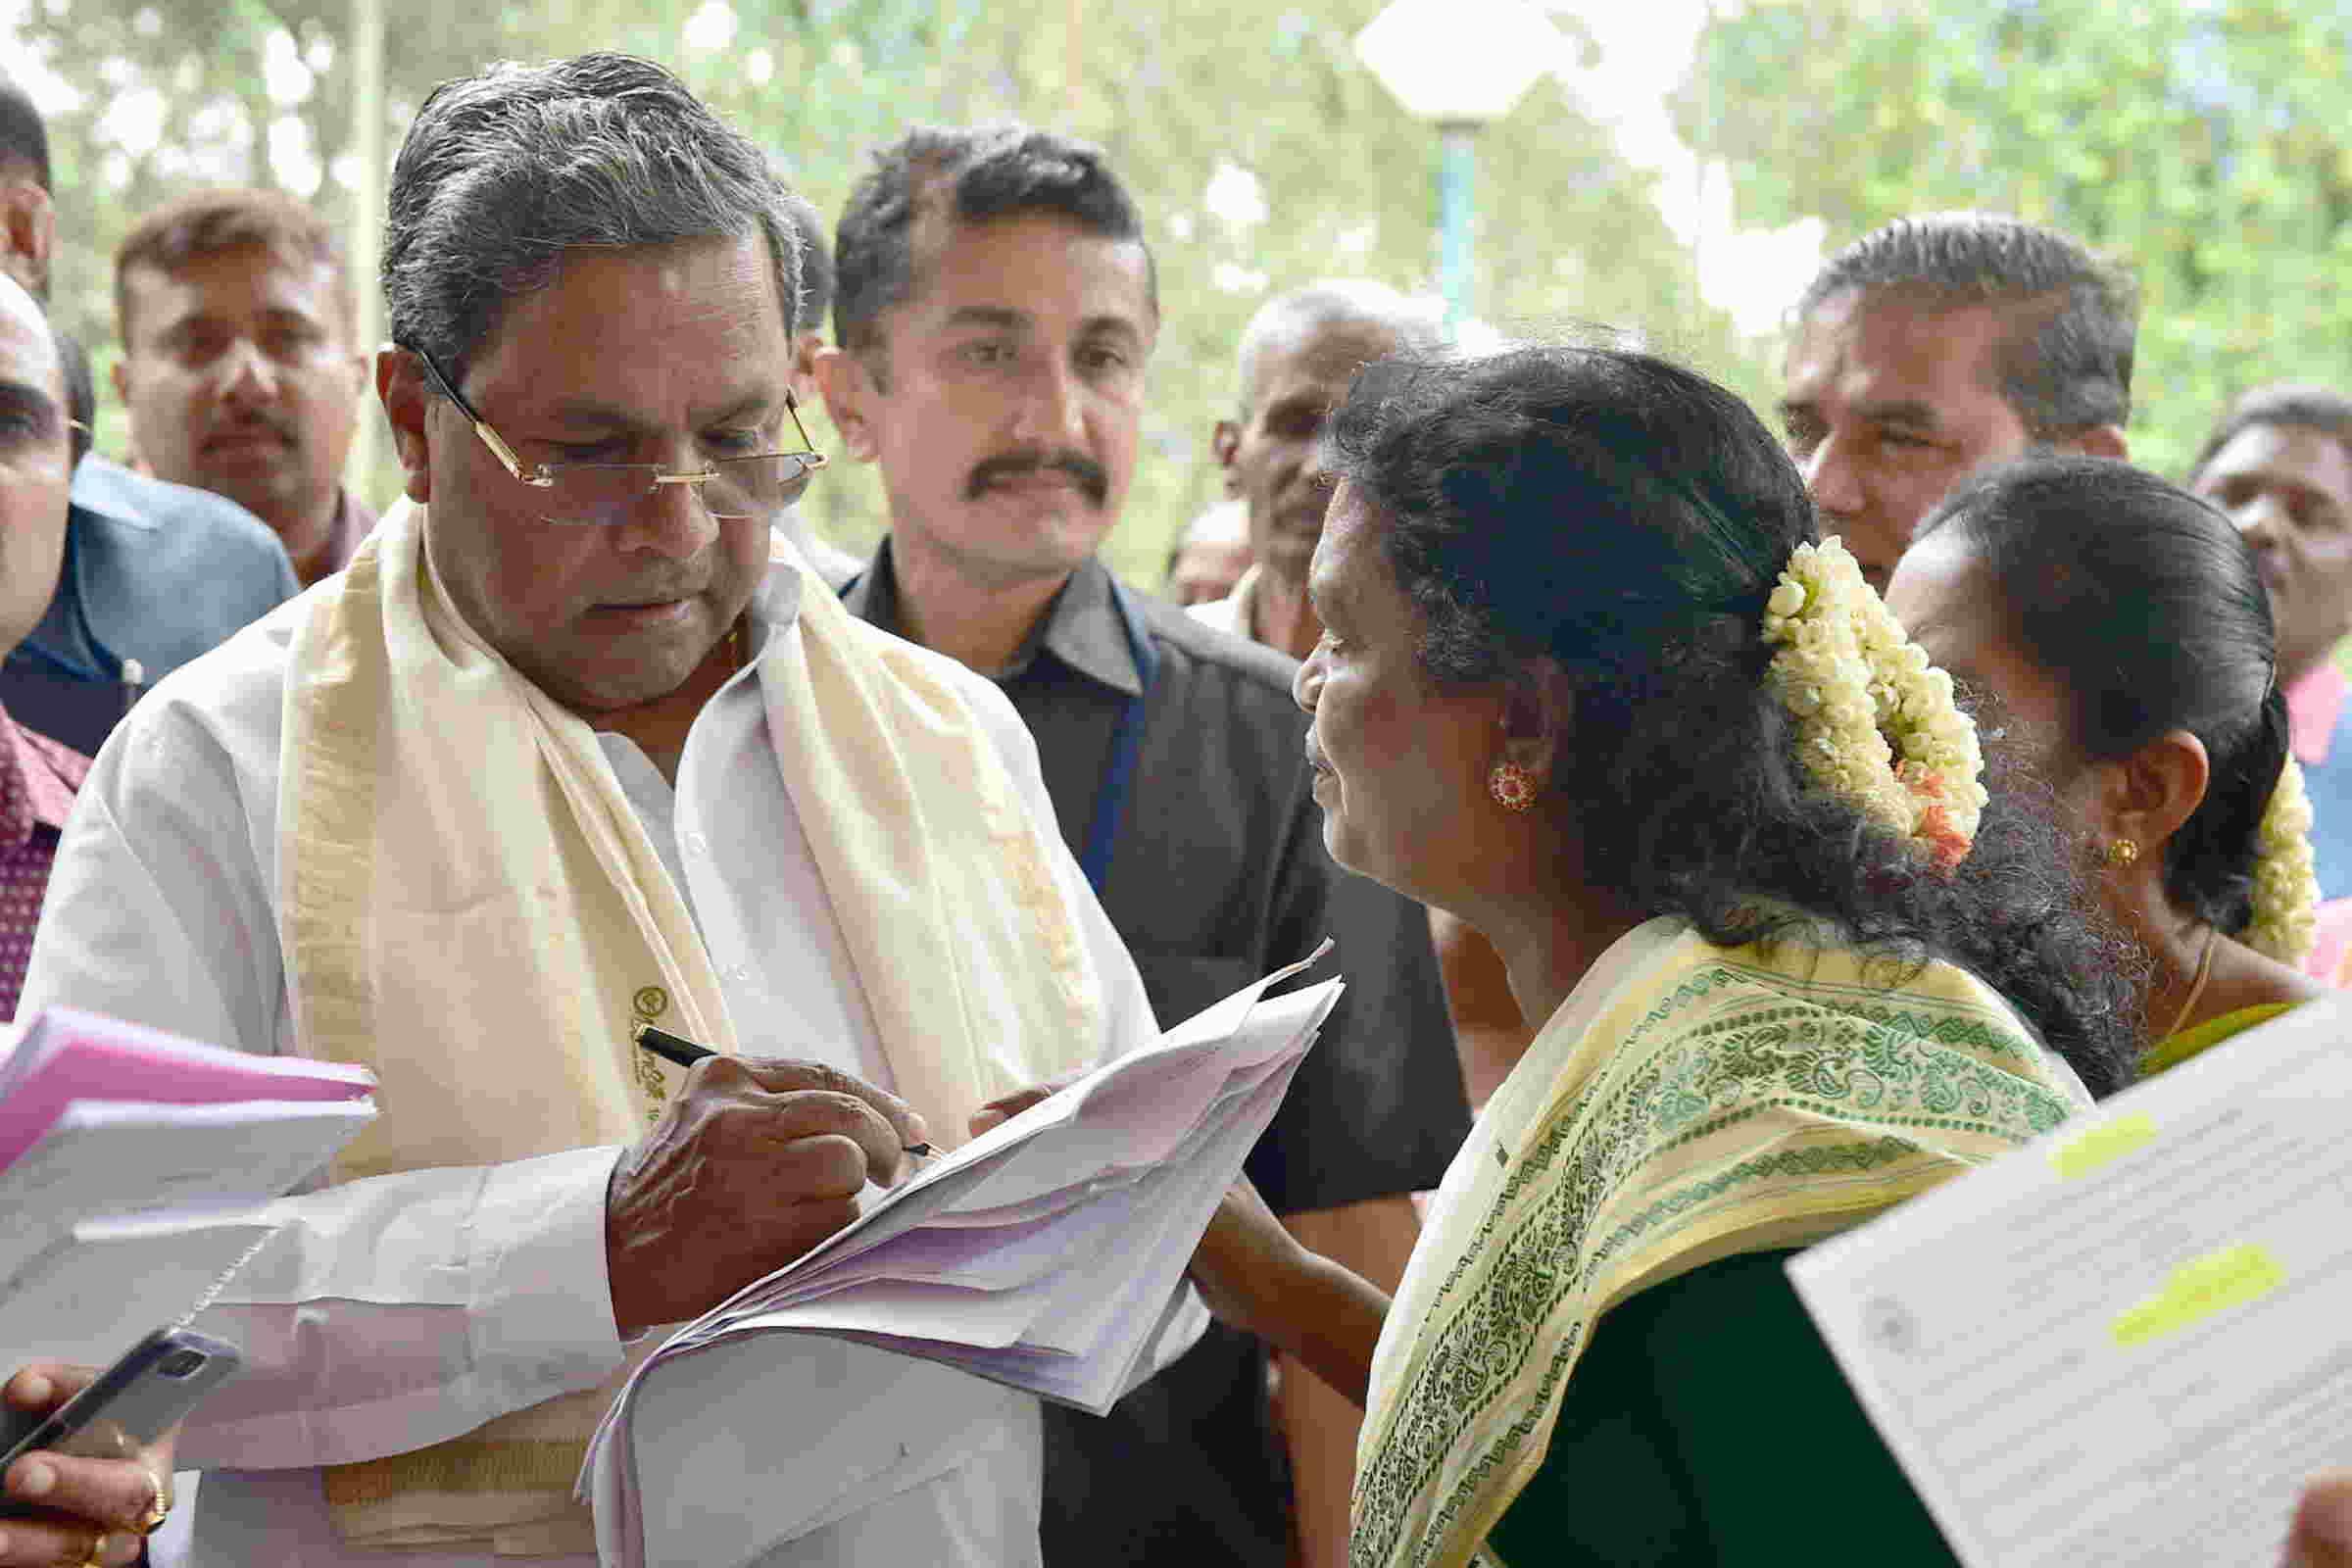 EAR TO THE GROUND: Karnataka Chief Minister Siddaramaiah hears public grievances at Cauvery in Bengaluru, UNI